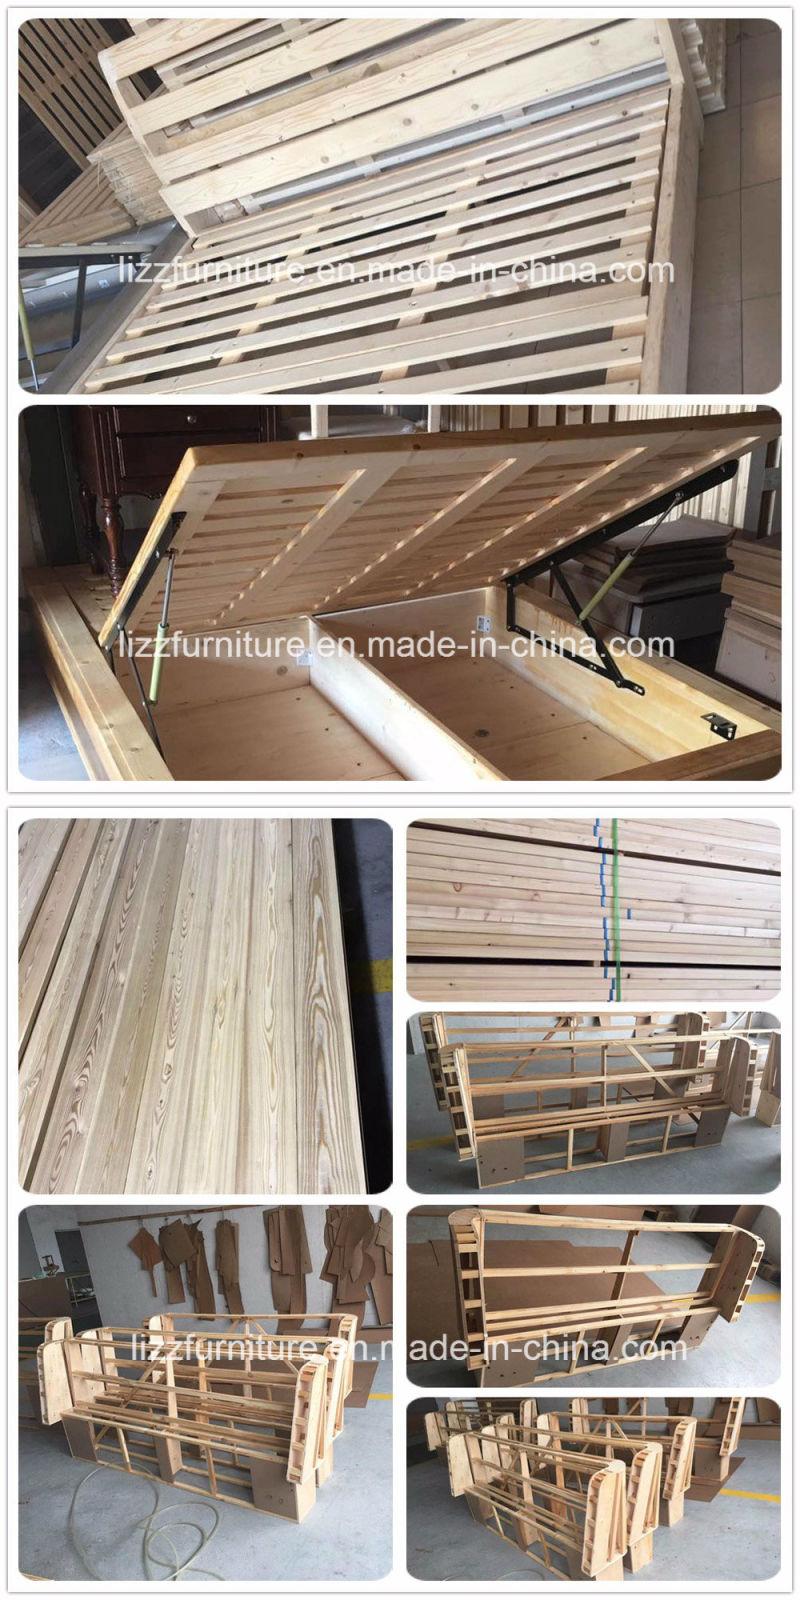 Tela suave King-Size multifuncional modulares dormitorio cama – Tela ...